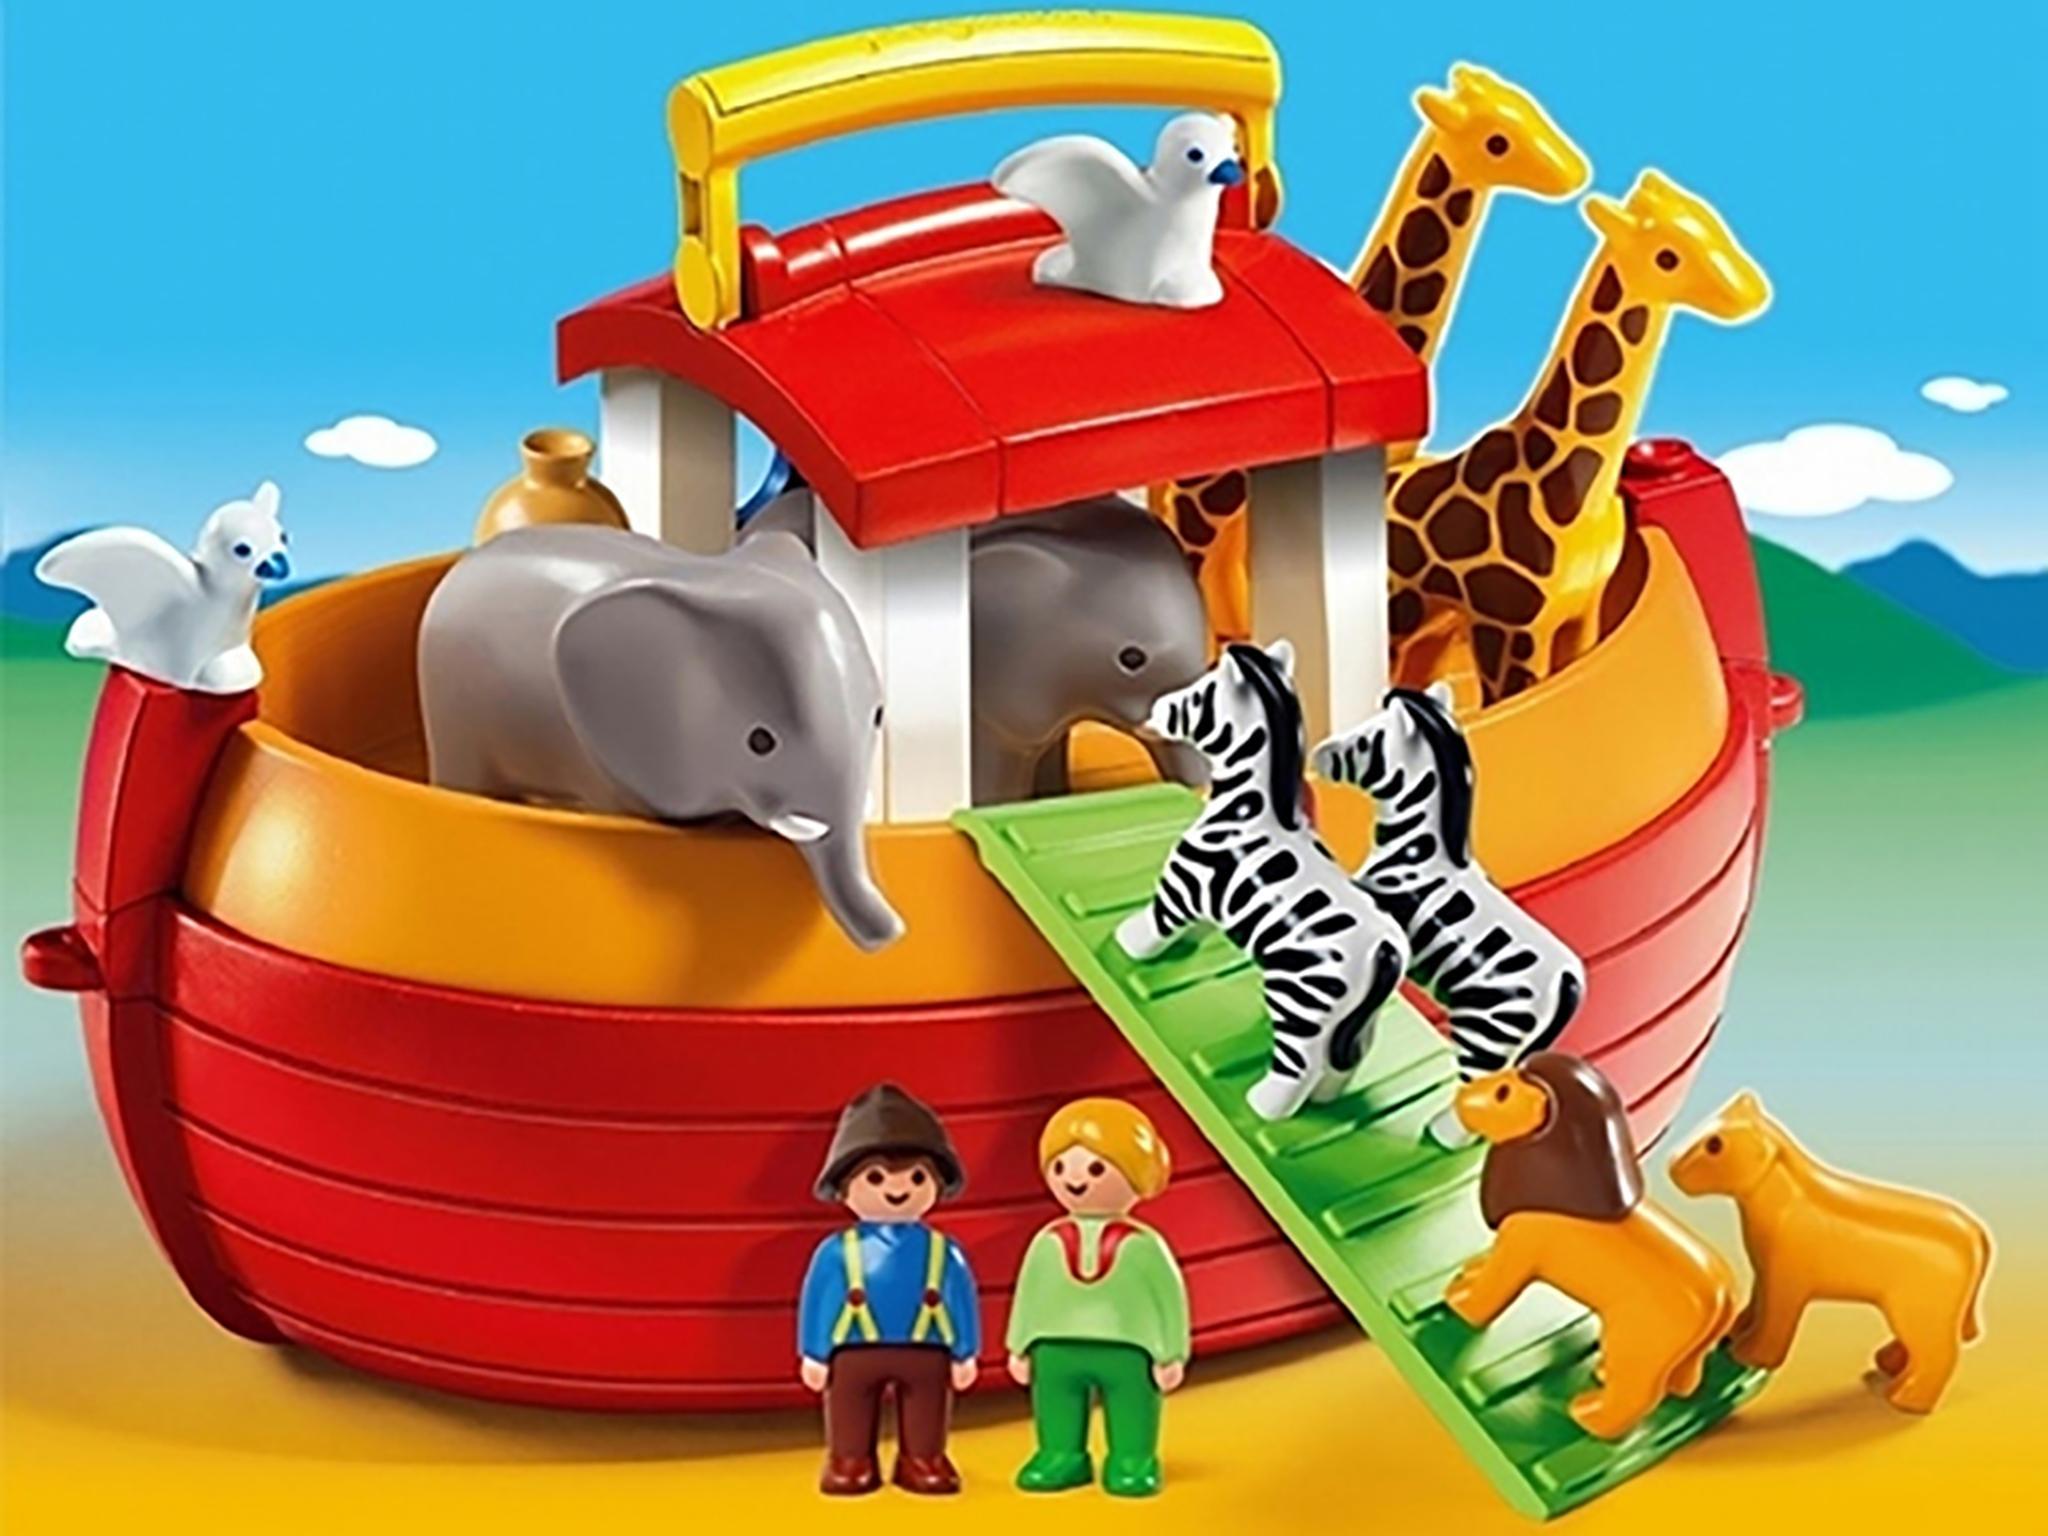 Many Of Playmobils Toys